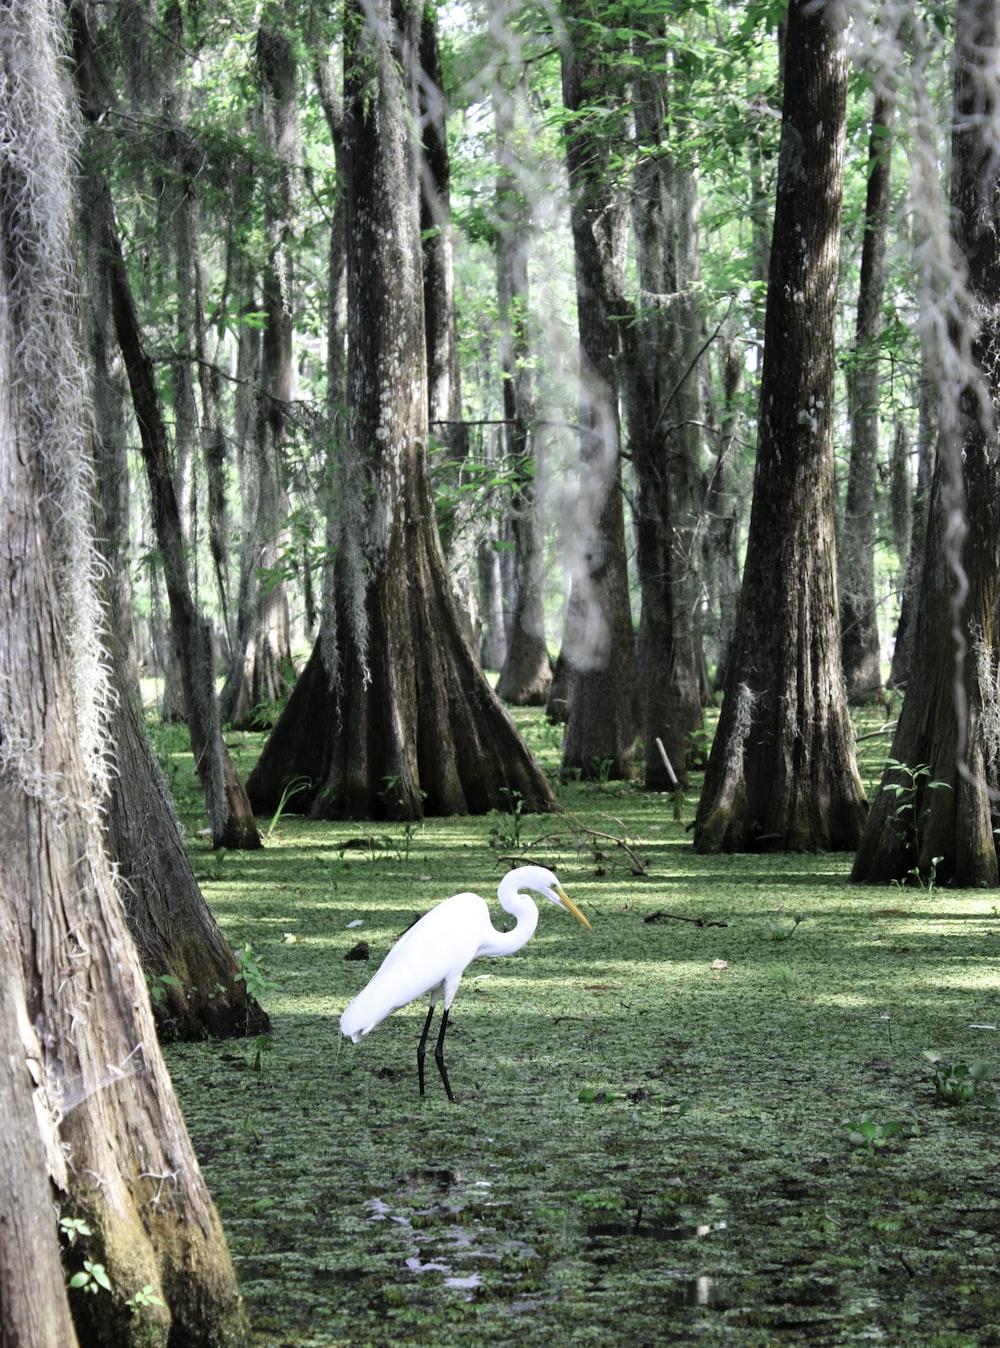 white long beak bird on green grass field near brown tree during daytime